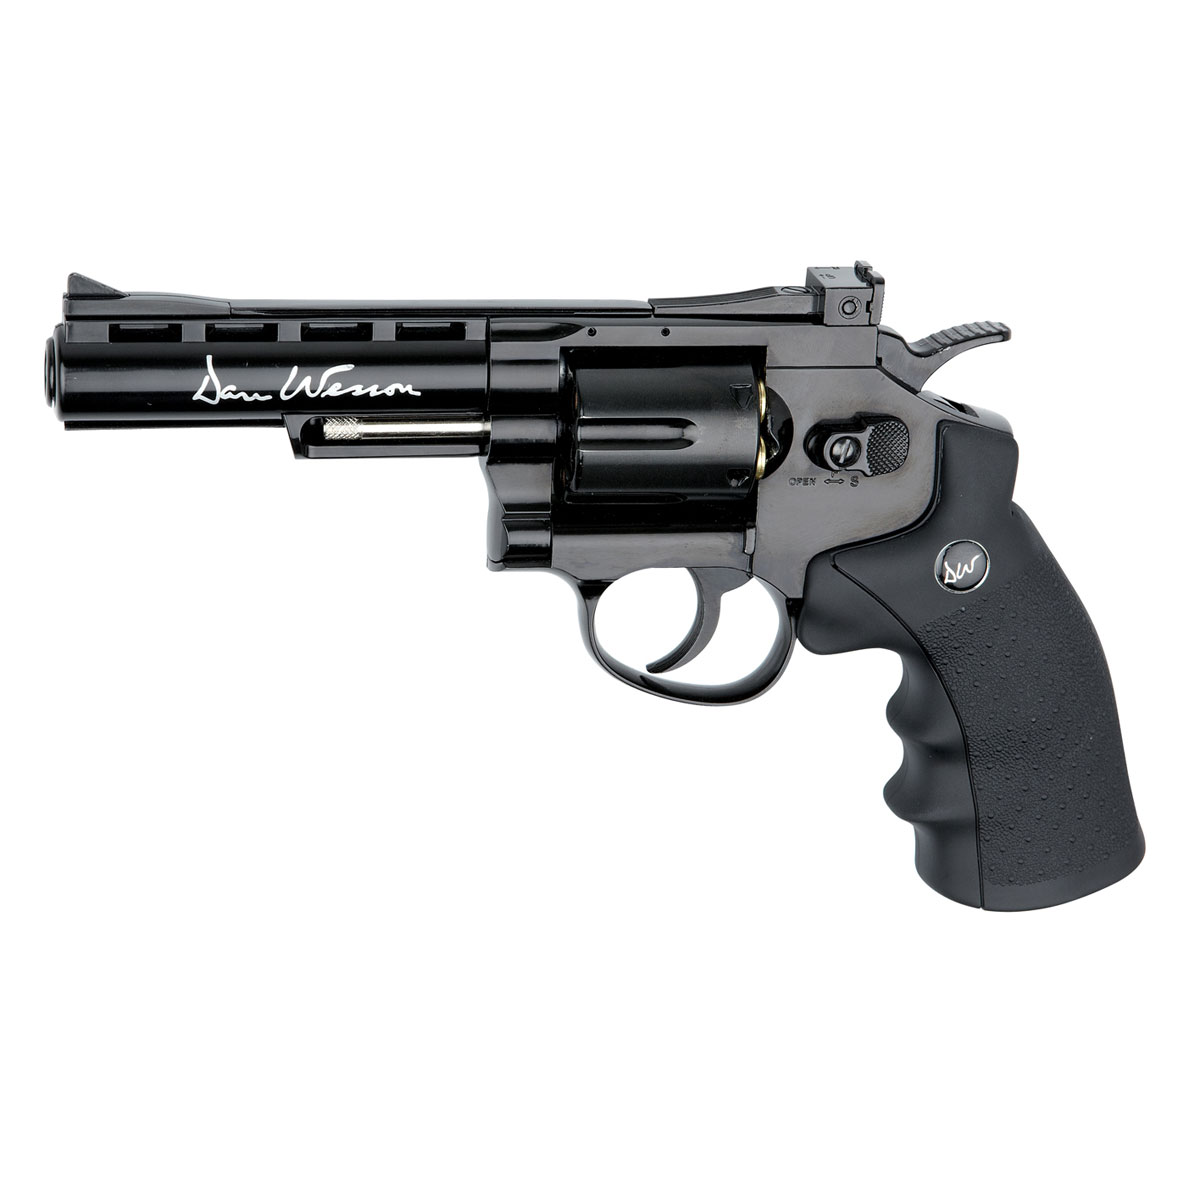 "ASG ""Dan Wesson 4inch"" револьвер пневматический CO2, 4,5 мм, цвет: Black (17176)"